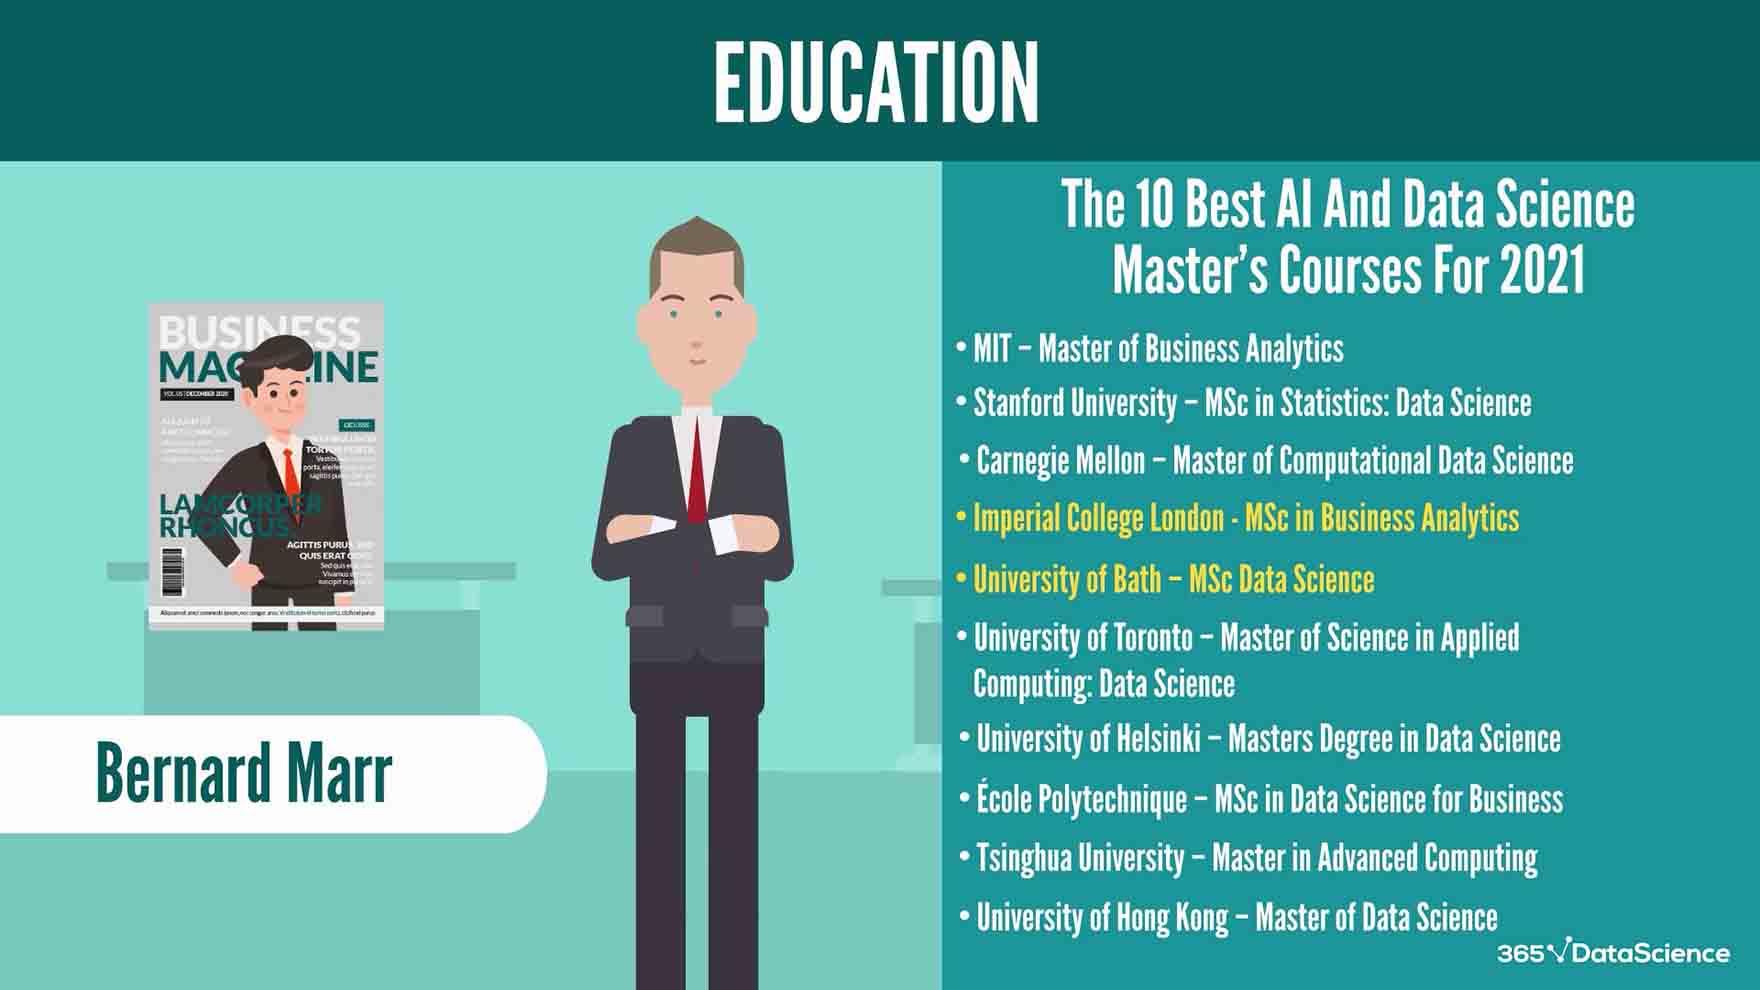 Best data science degree programs, according to Bernard Marr